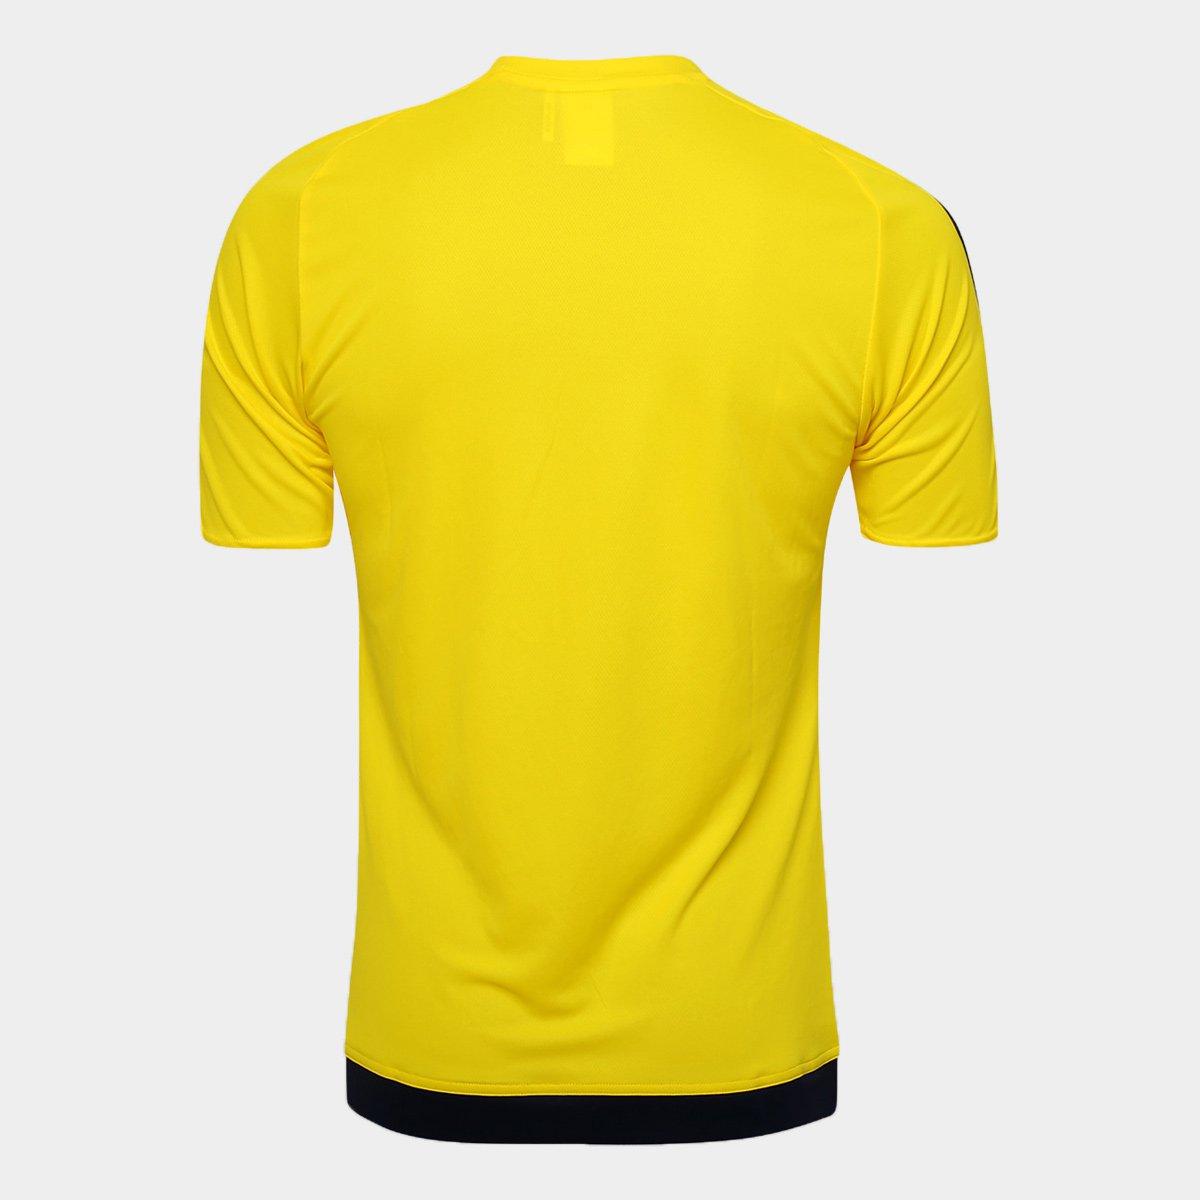 Camisa Adidas Estro 15 Masculina - Amarelo - Compre Agora  f27575fb16836